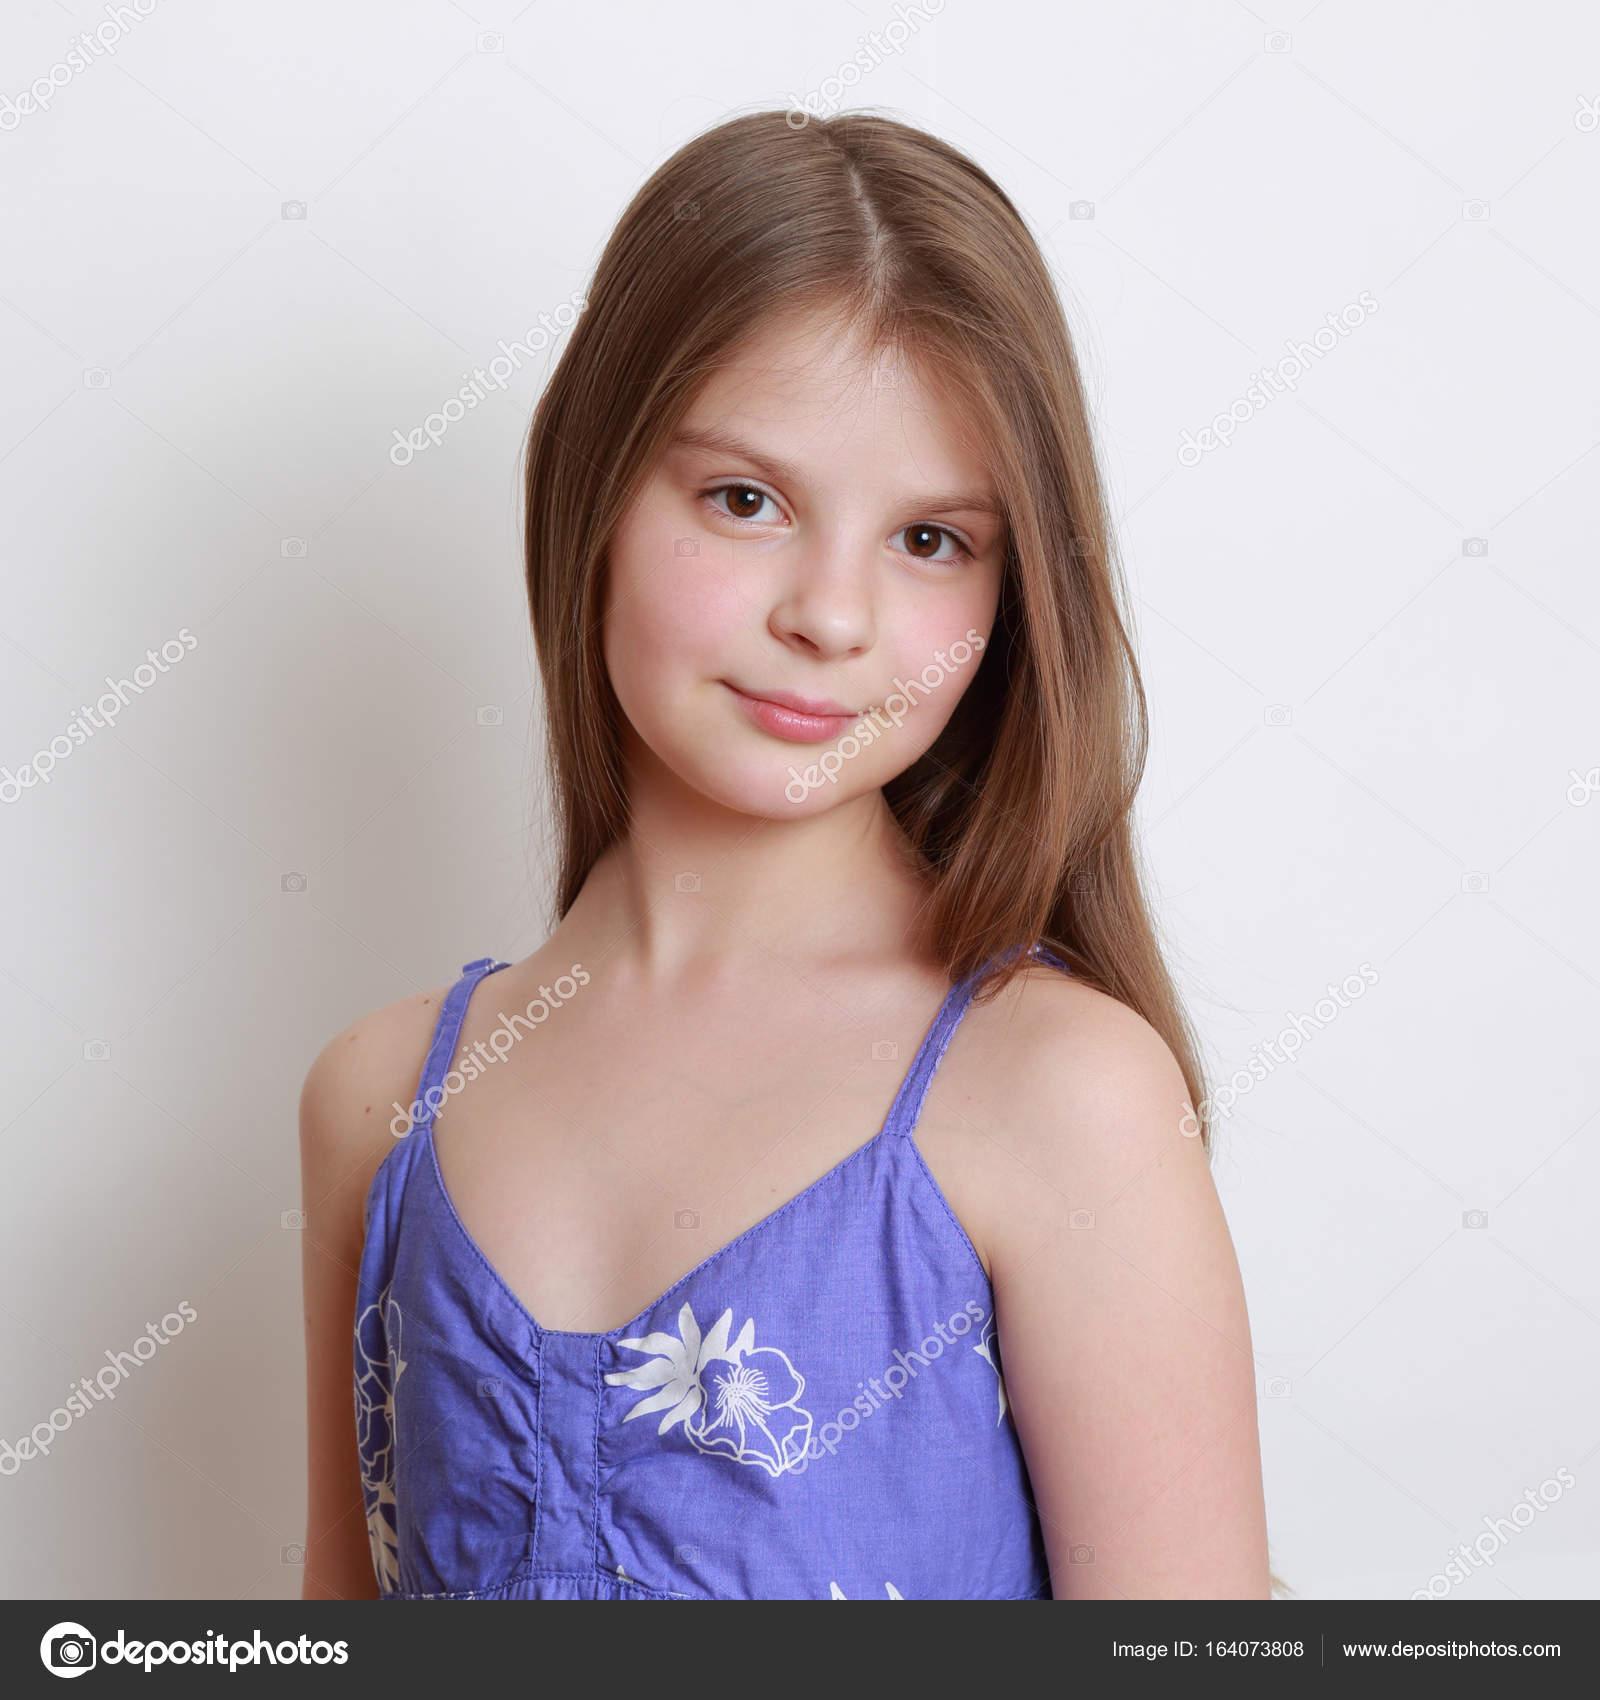 اجمل صور بنات 2020 اجمل صور بنات اطفال خلفيات بنات صغيره جميلة جدا 40